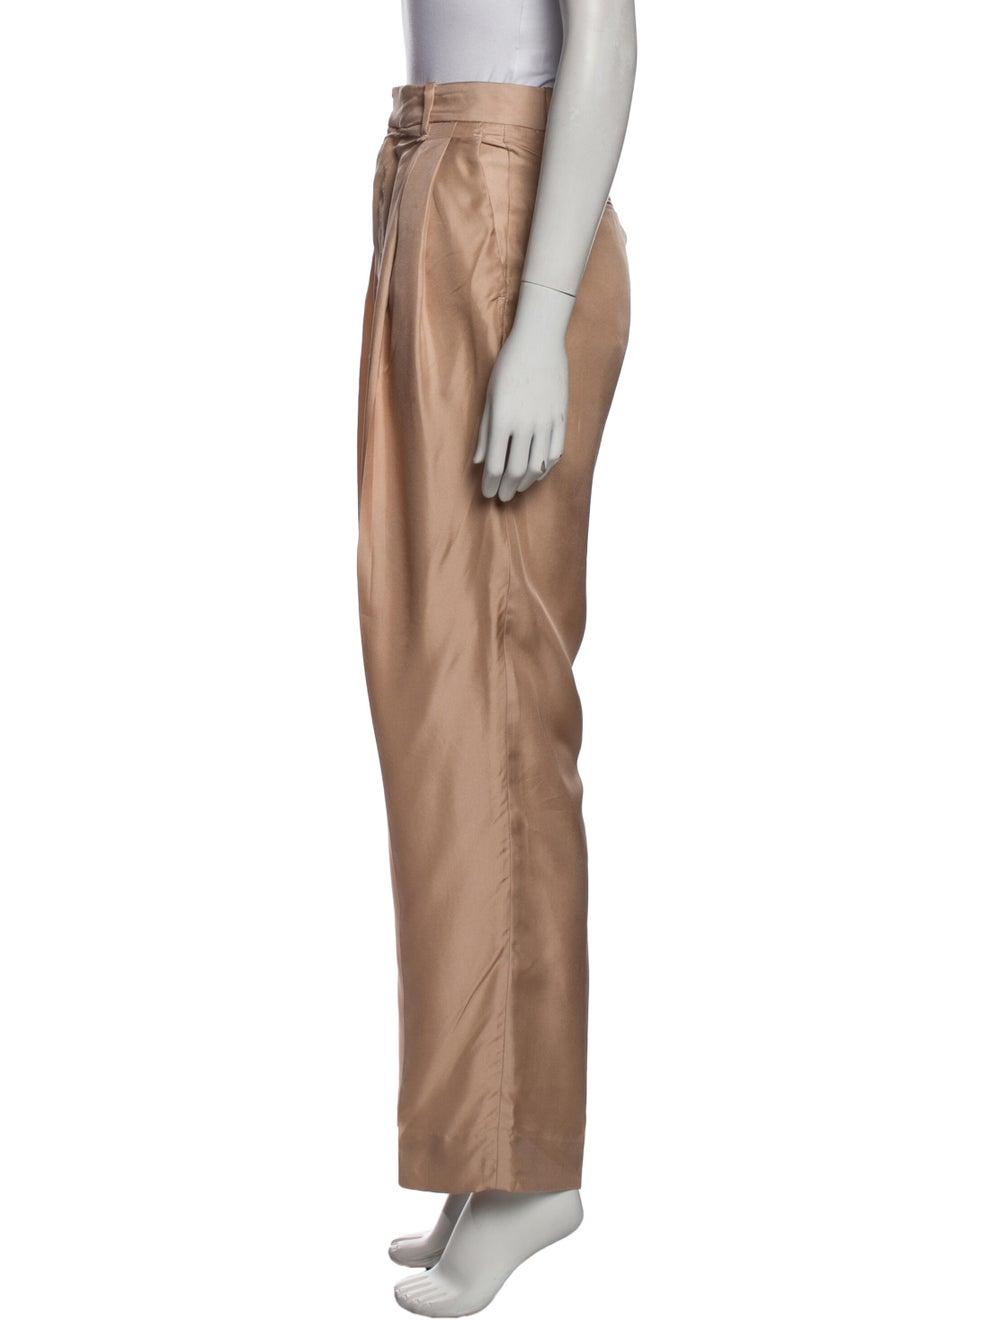 Rag & Bone Silk Straight Leg Pants - image 2